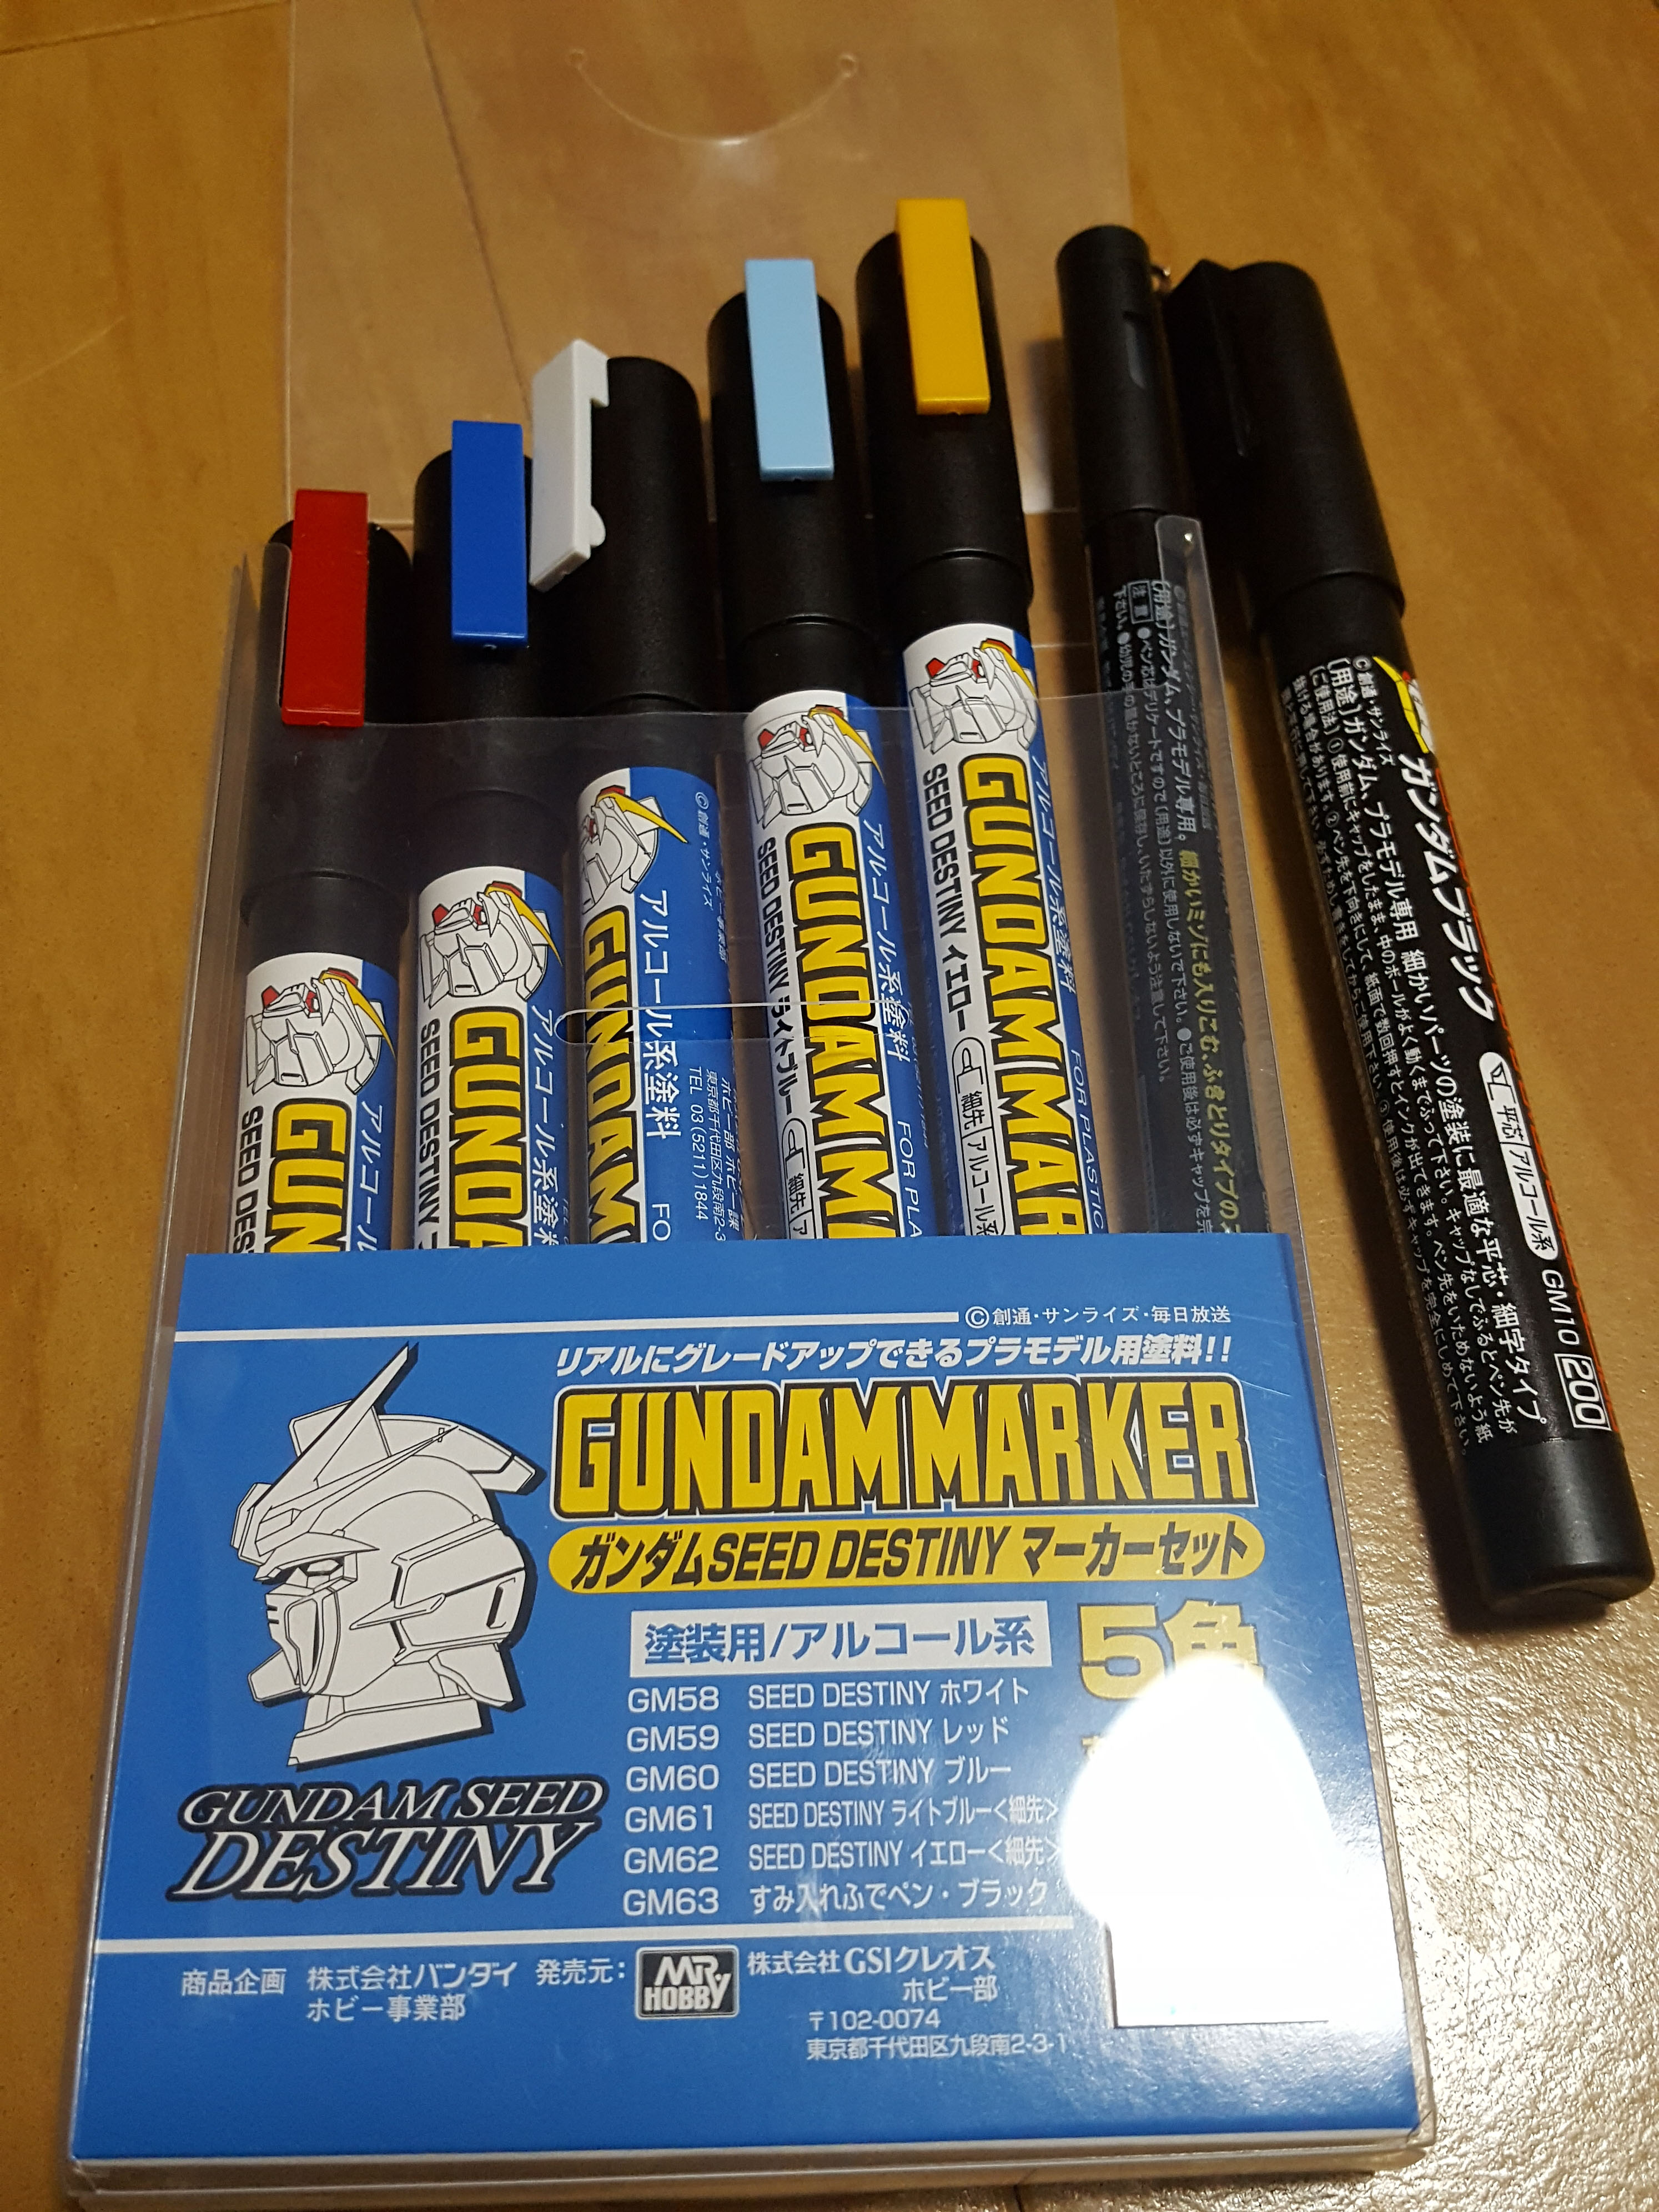 Gundam SEED Destiny Marker Set 6pcs #1